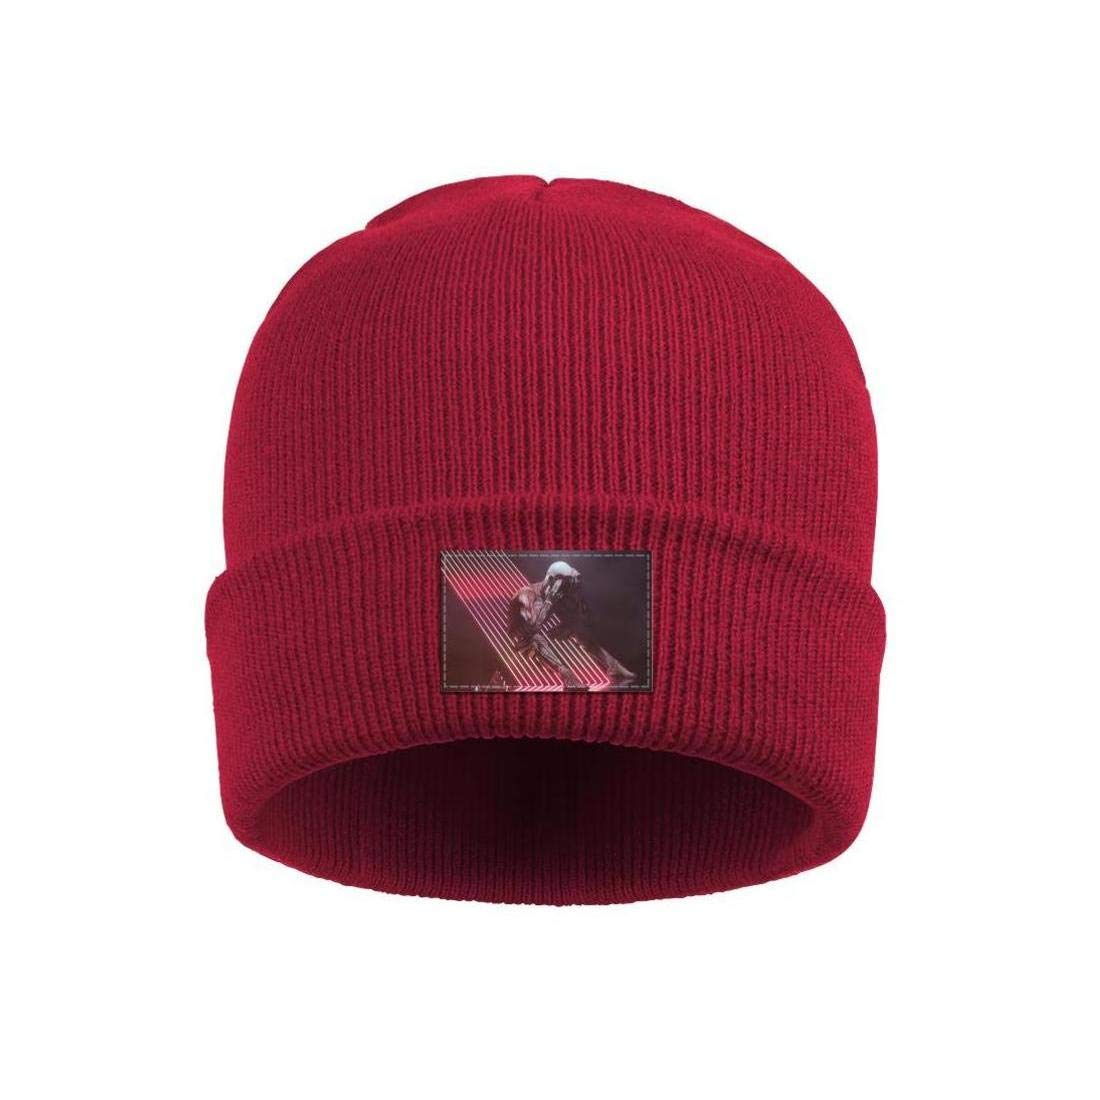 KmTGlory Beanie Hats for Men Women Soft Beanie Knit Winter Caps